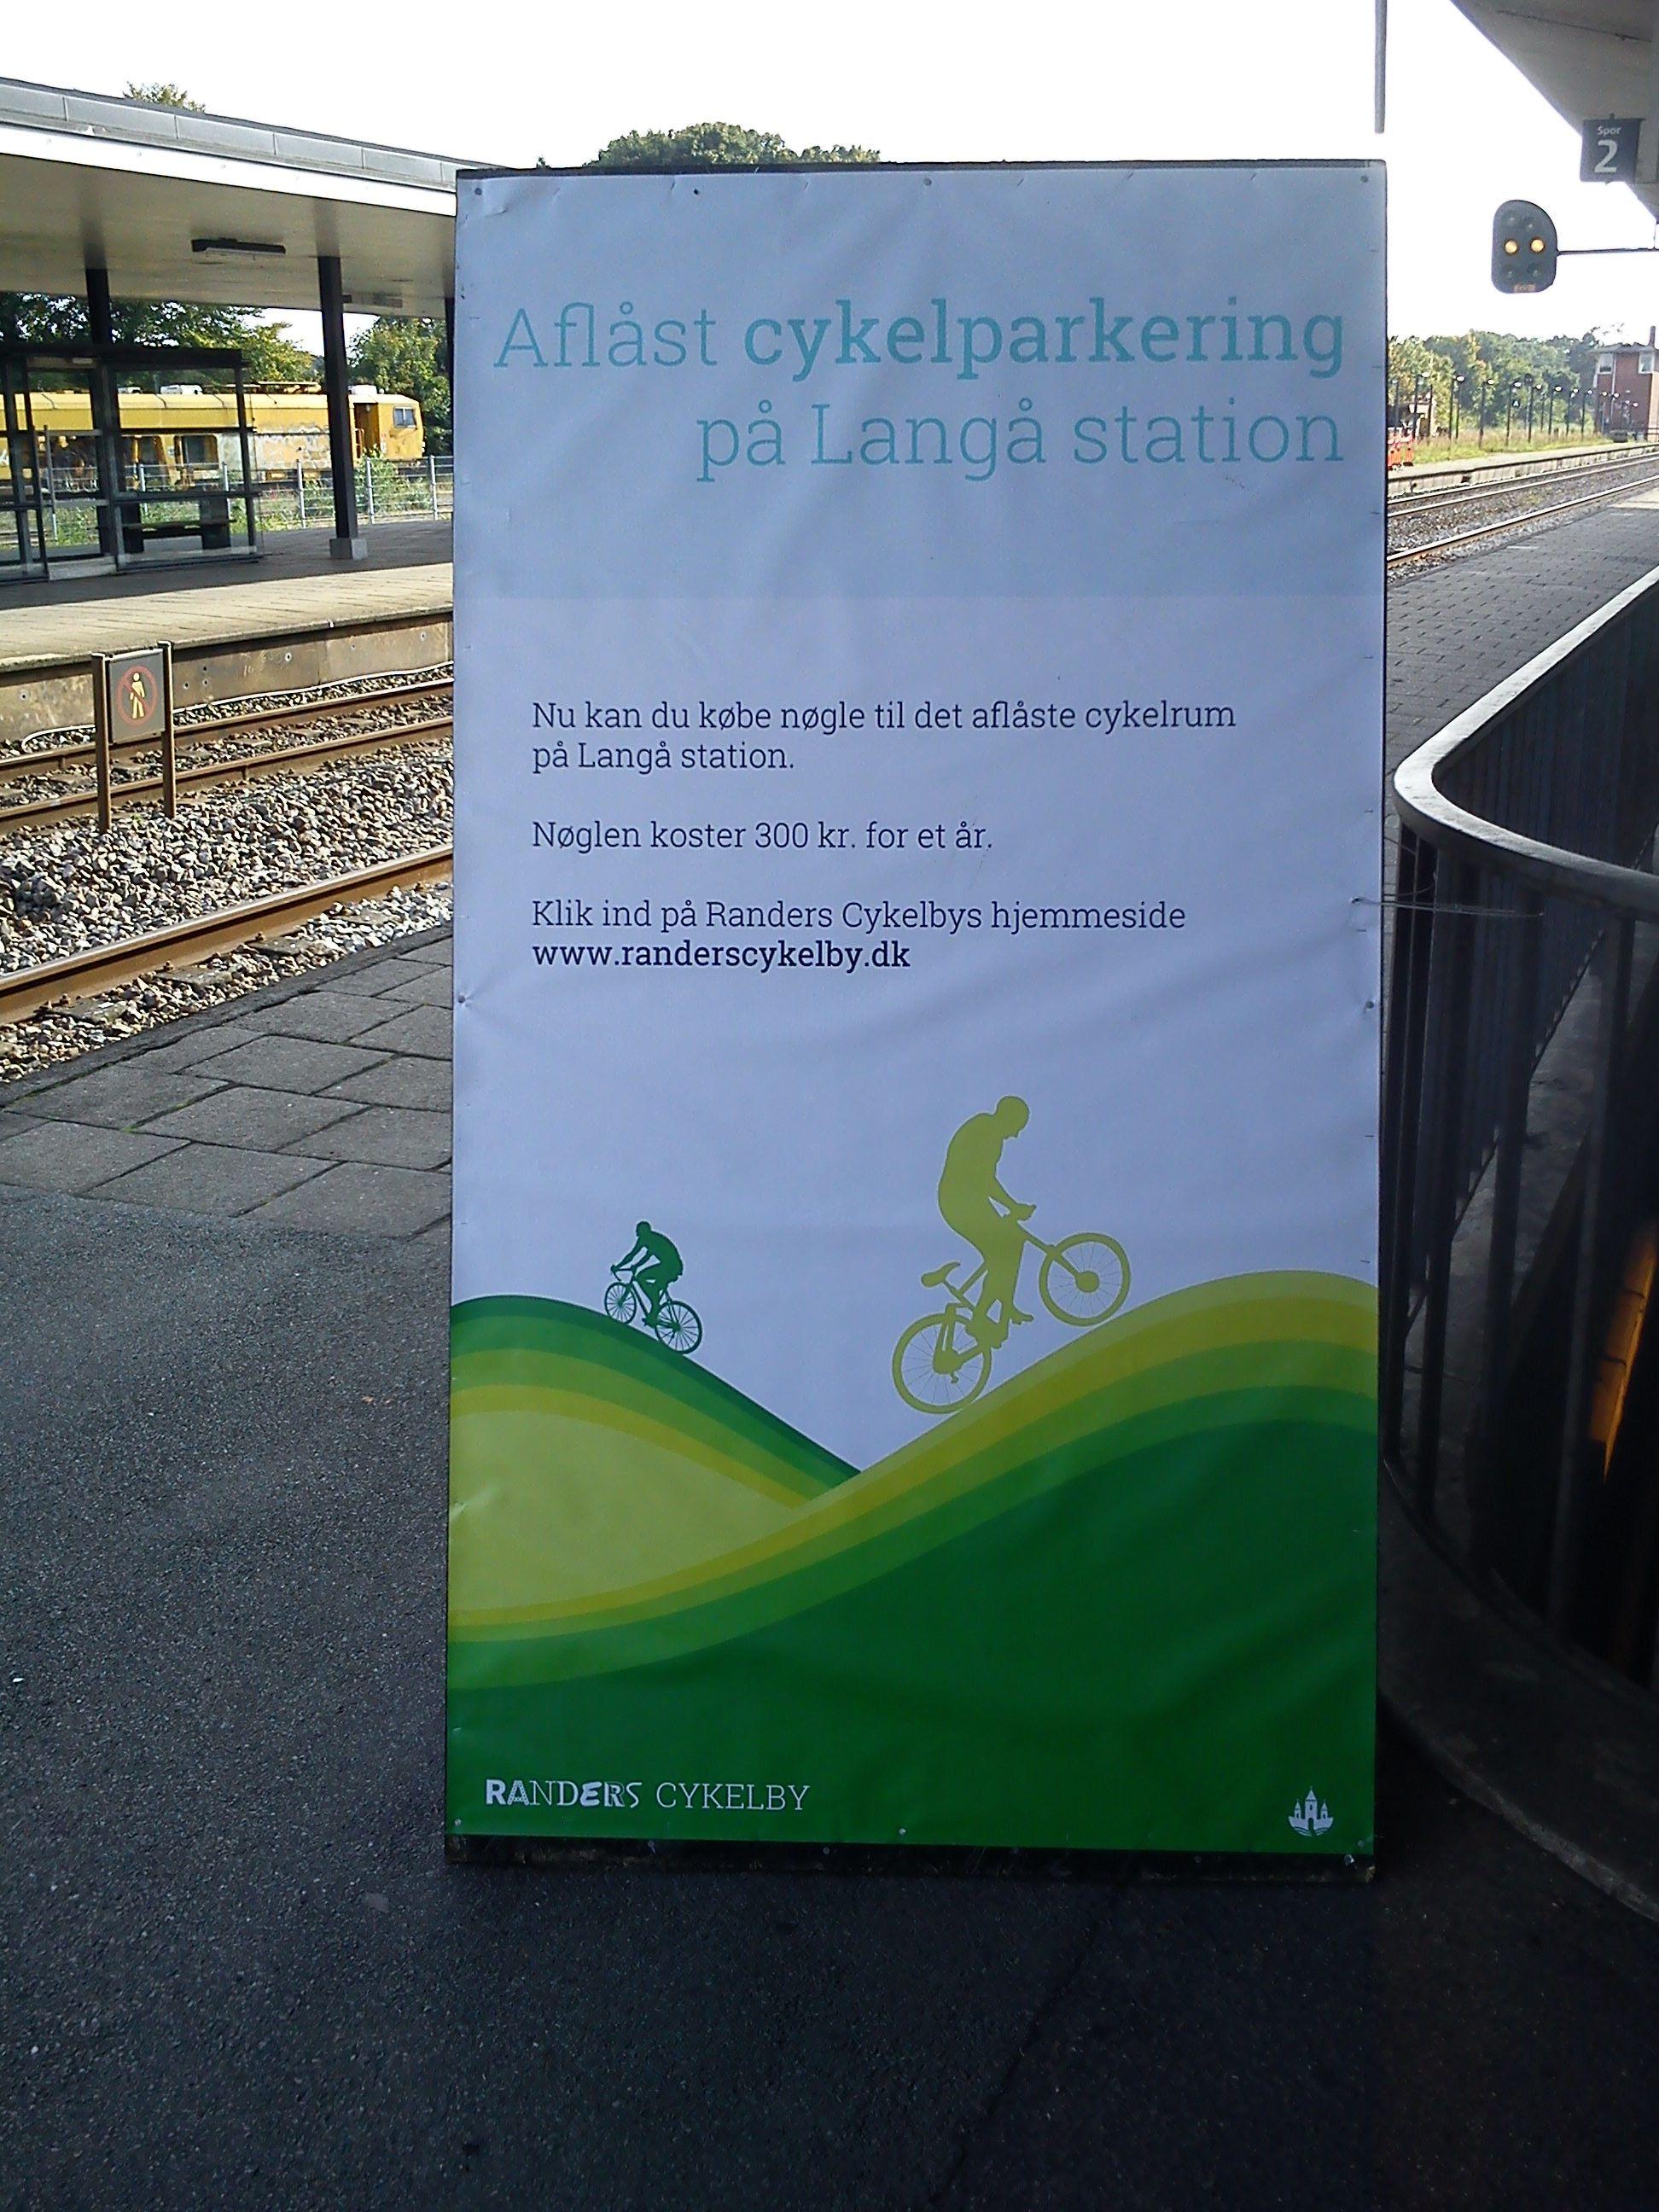 hellerup station cykelparkering